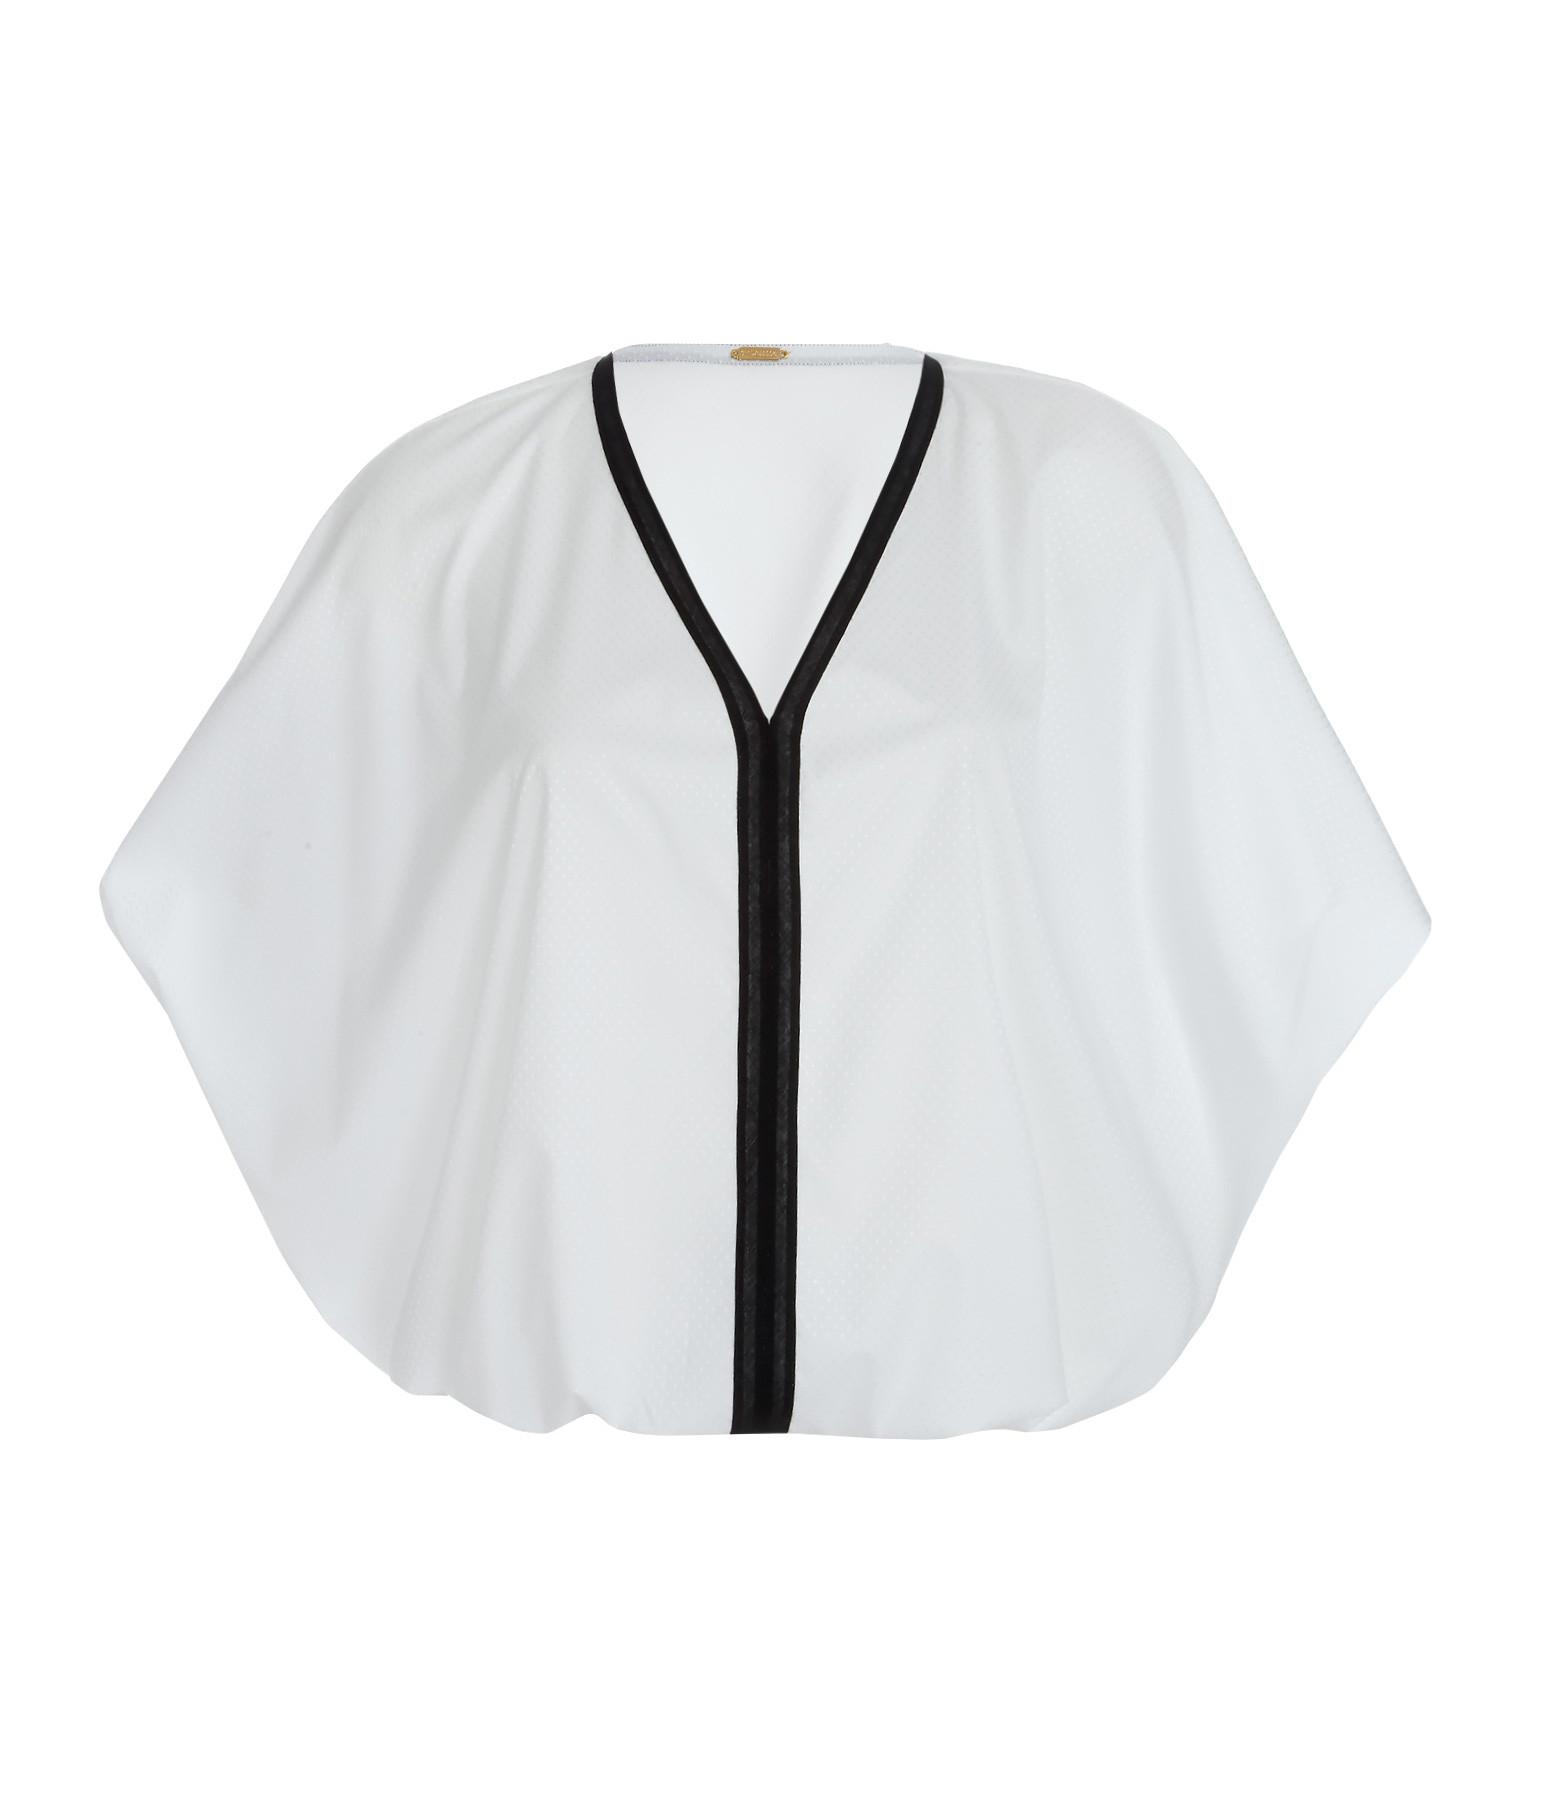 TOOSHIE - Top Anacapri Blanc Noir